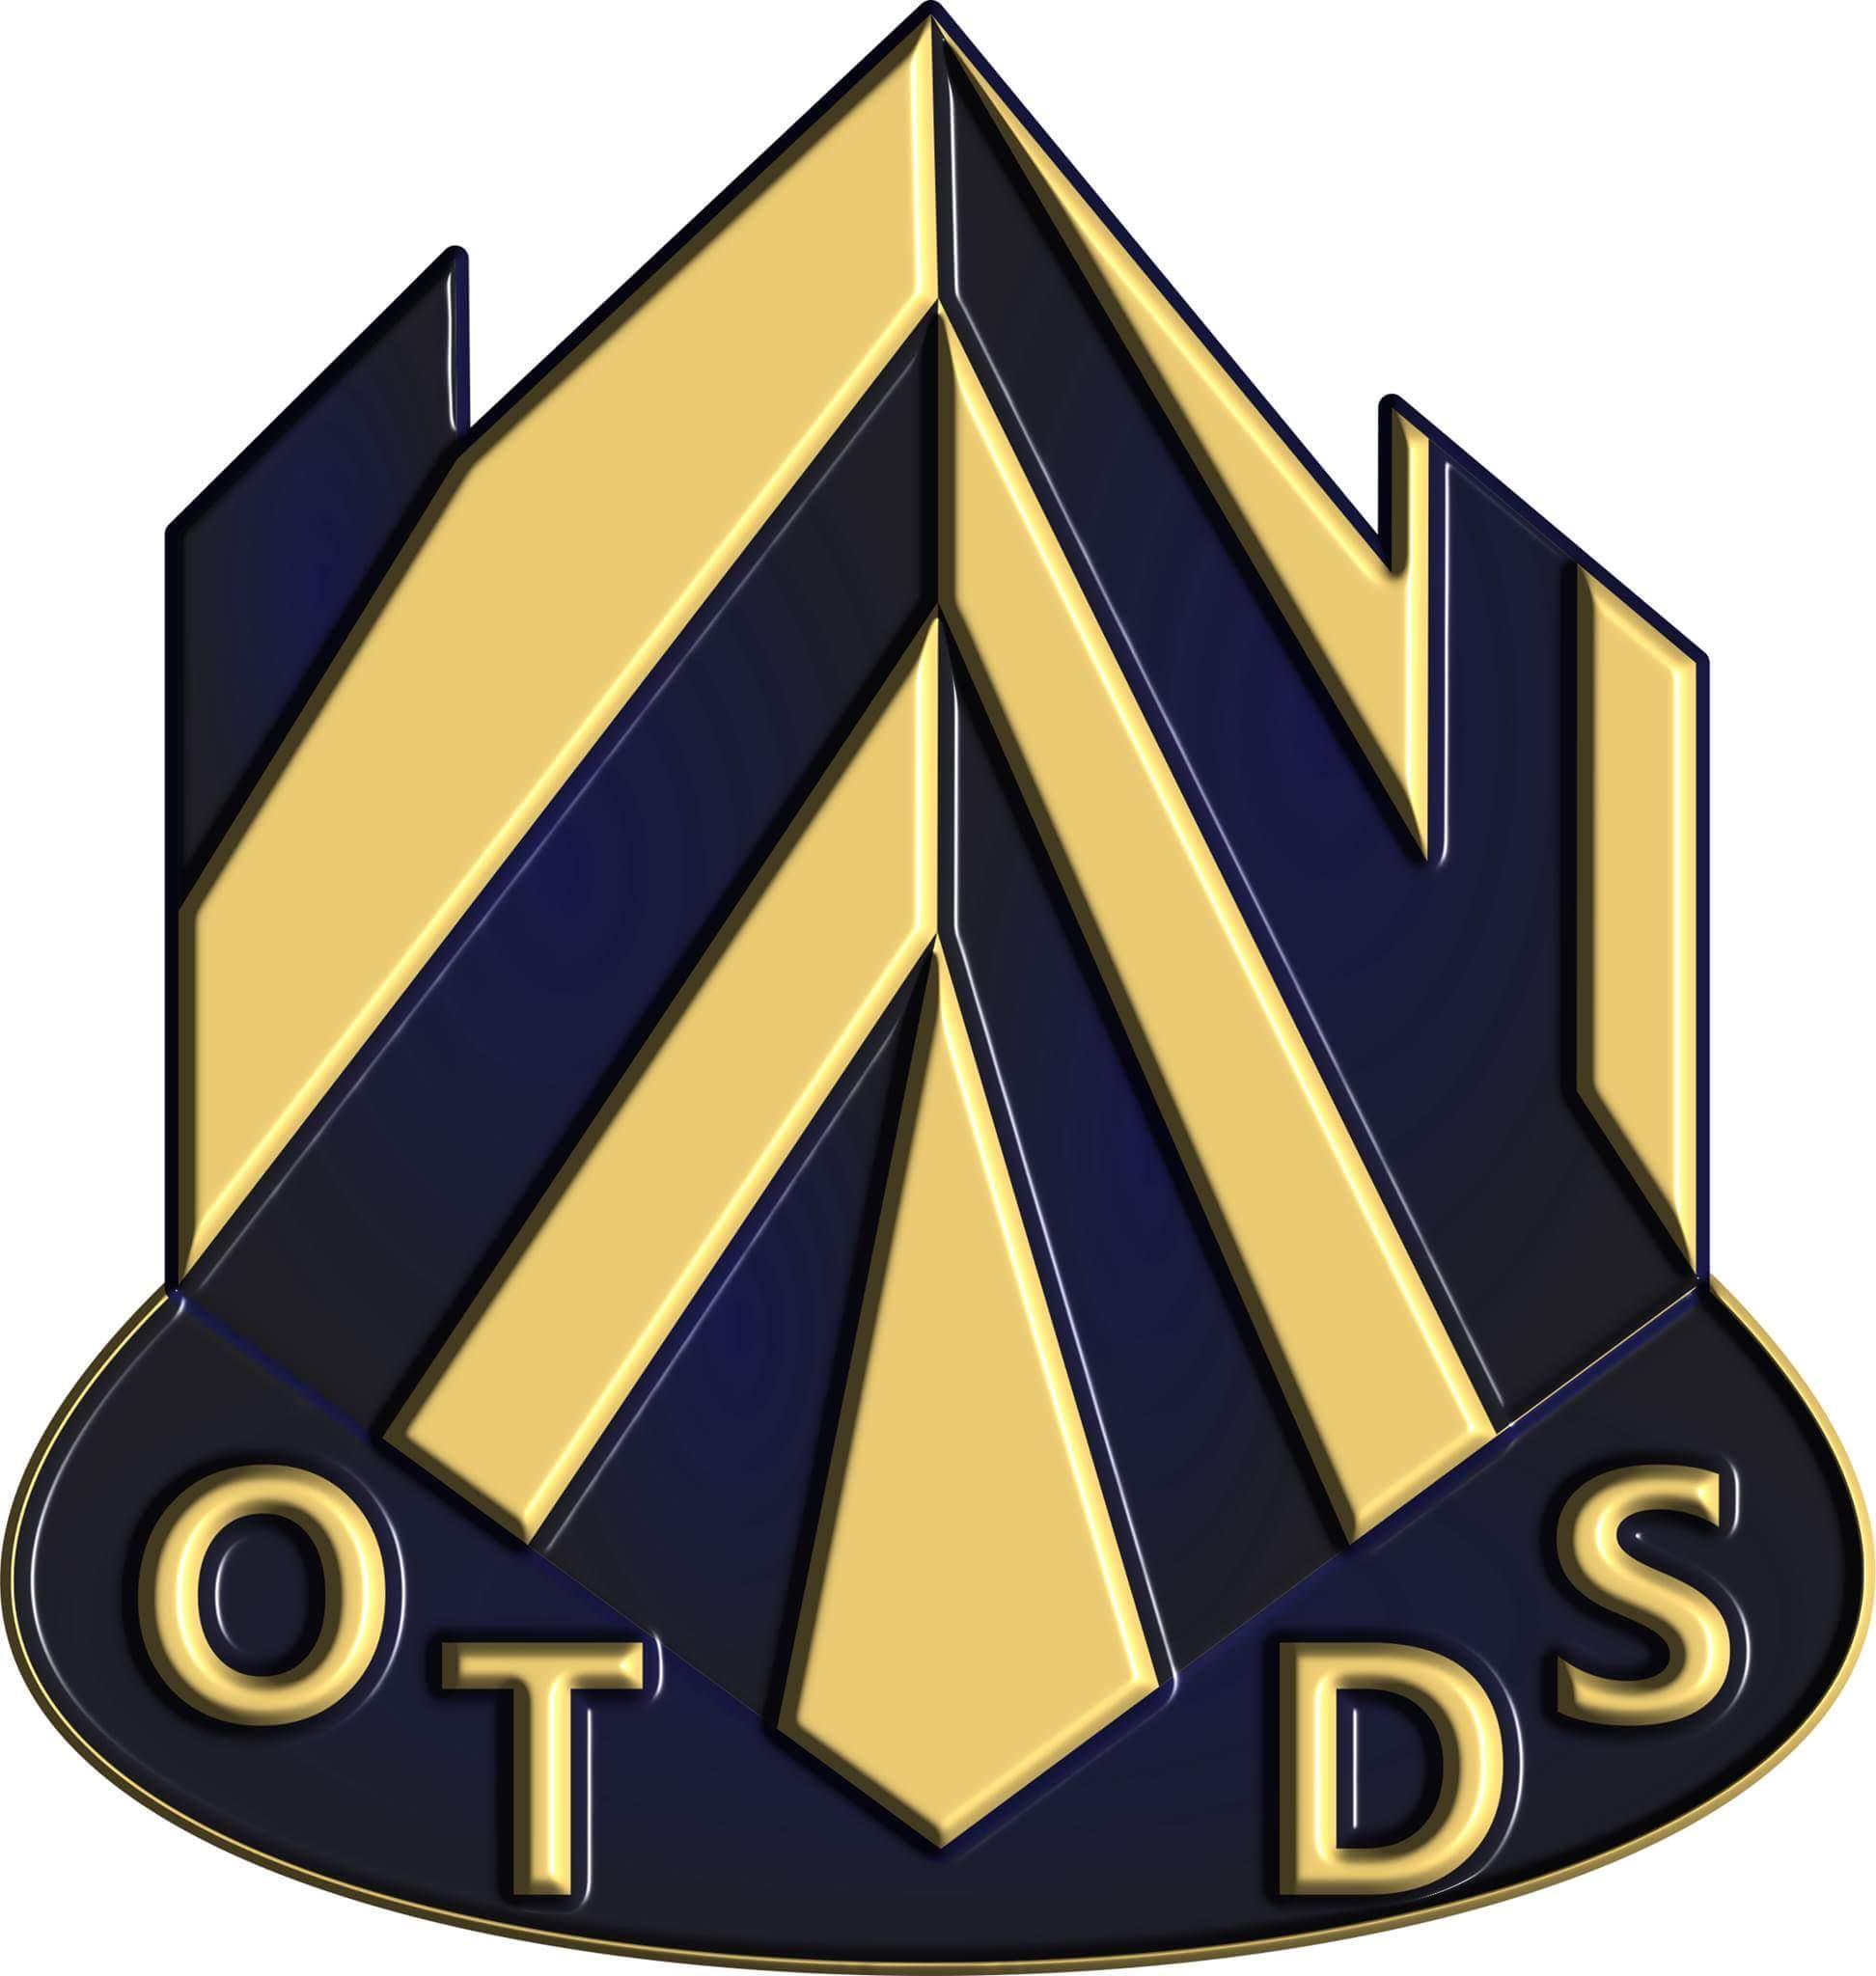 Opadis Billionaire Academy